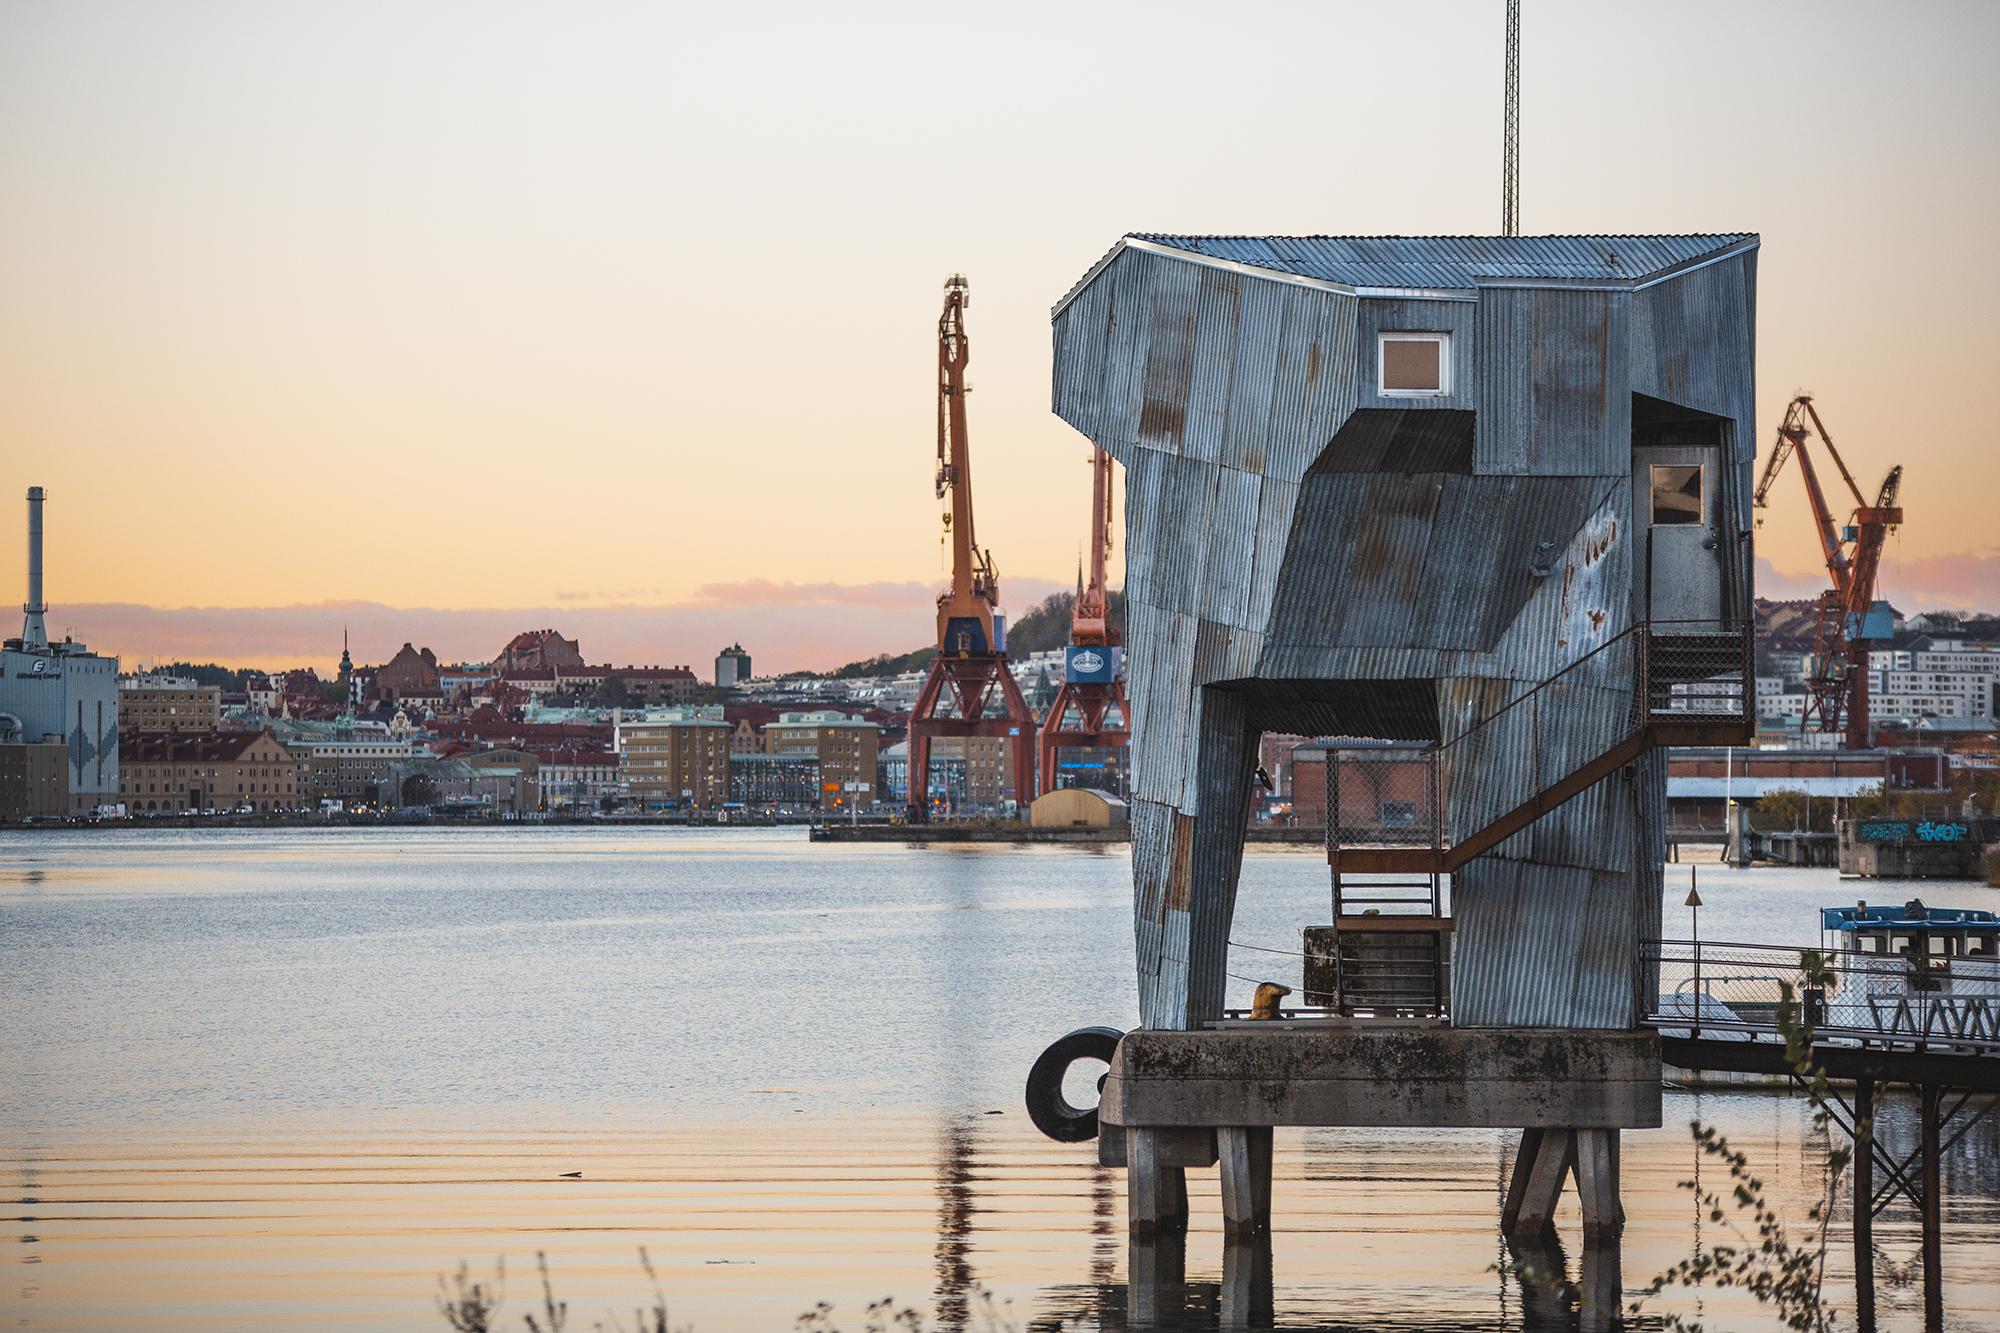 Allmänna bastun i Jubileumsparken. Foto: Peter Kvarnström.